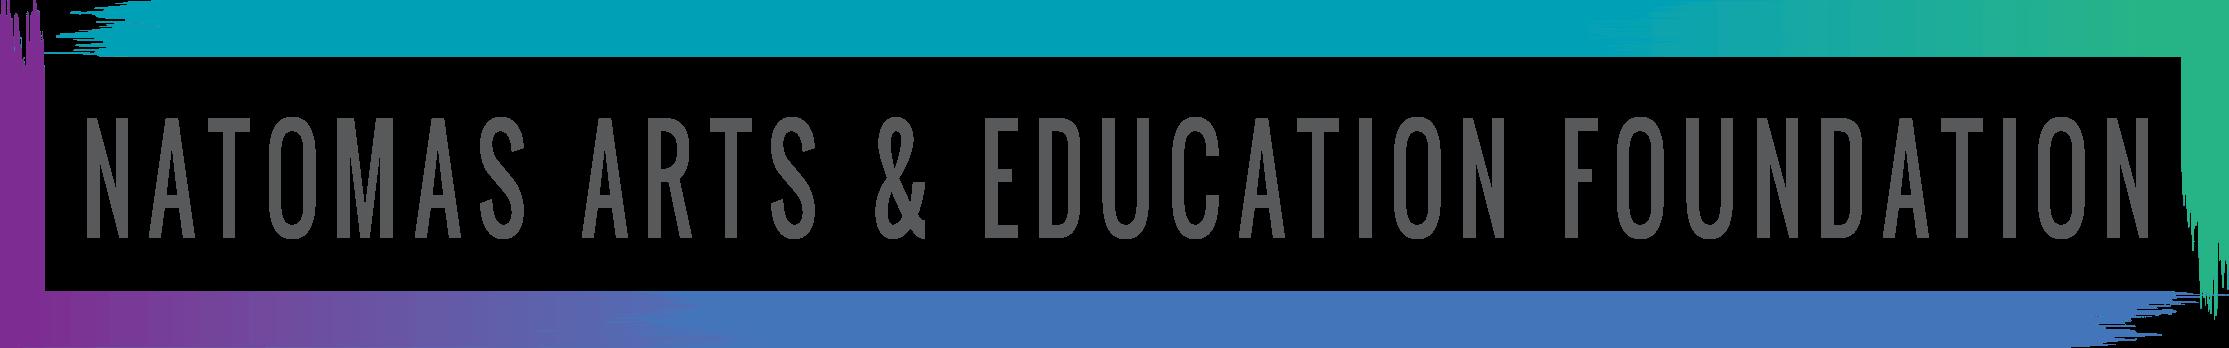 Natomas Arts & Education Foundation